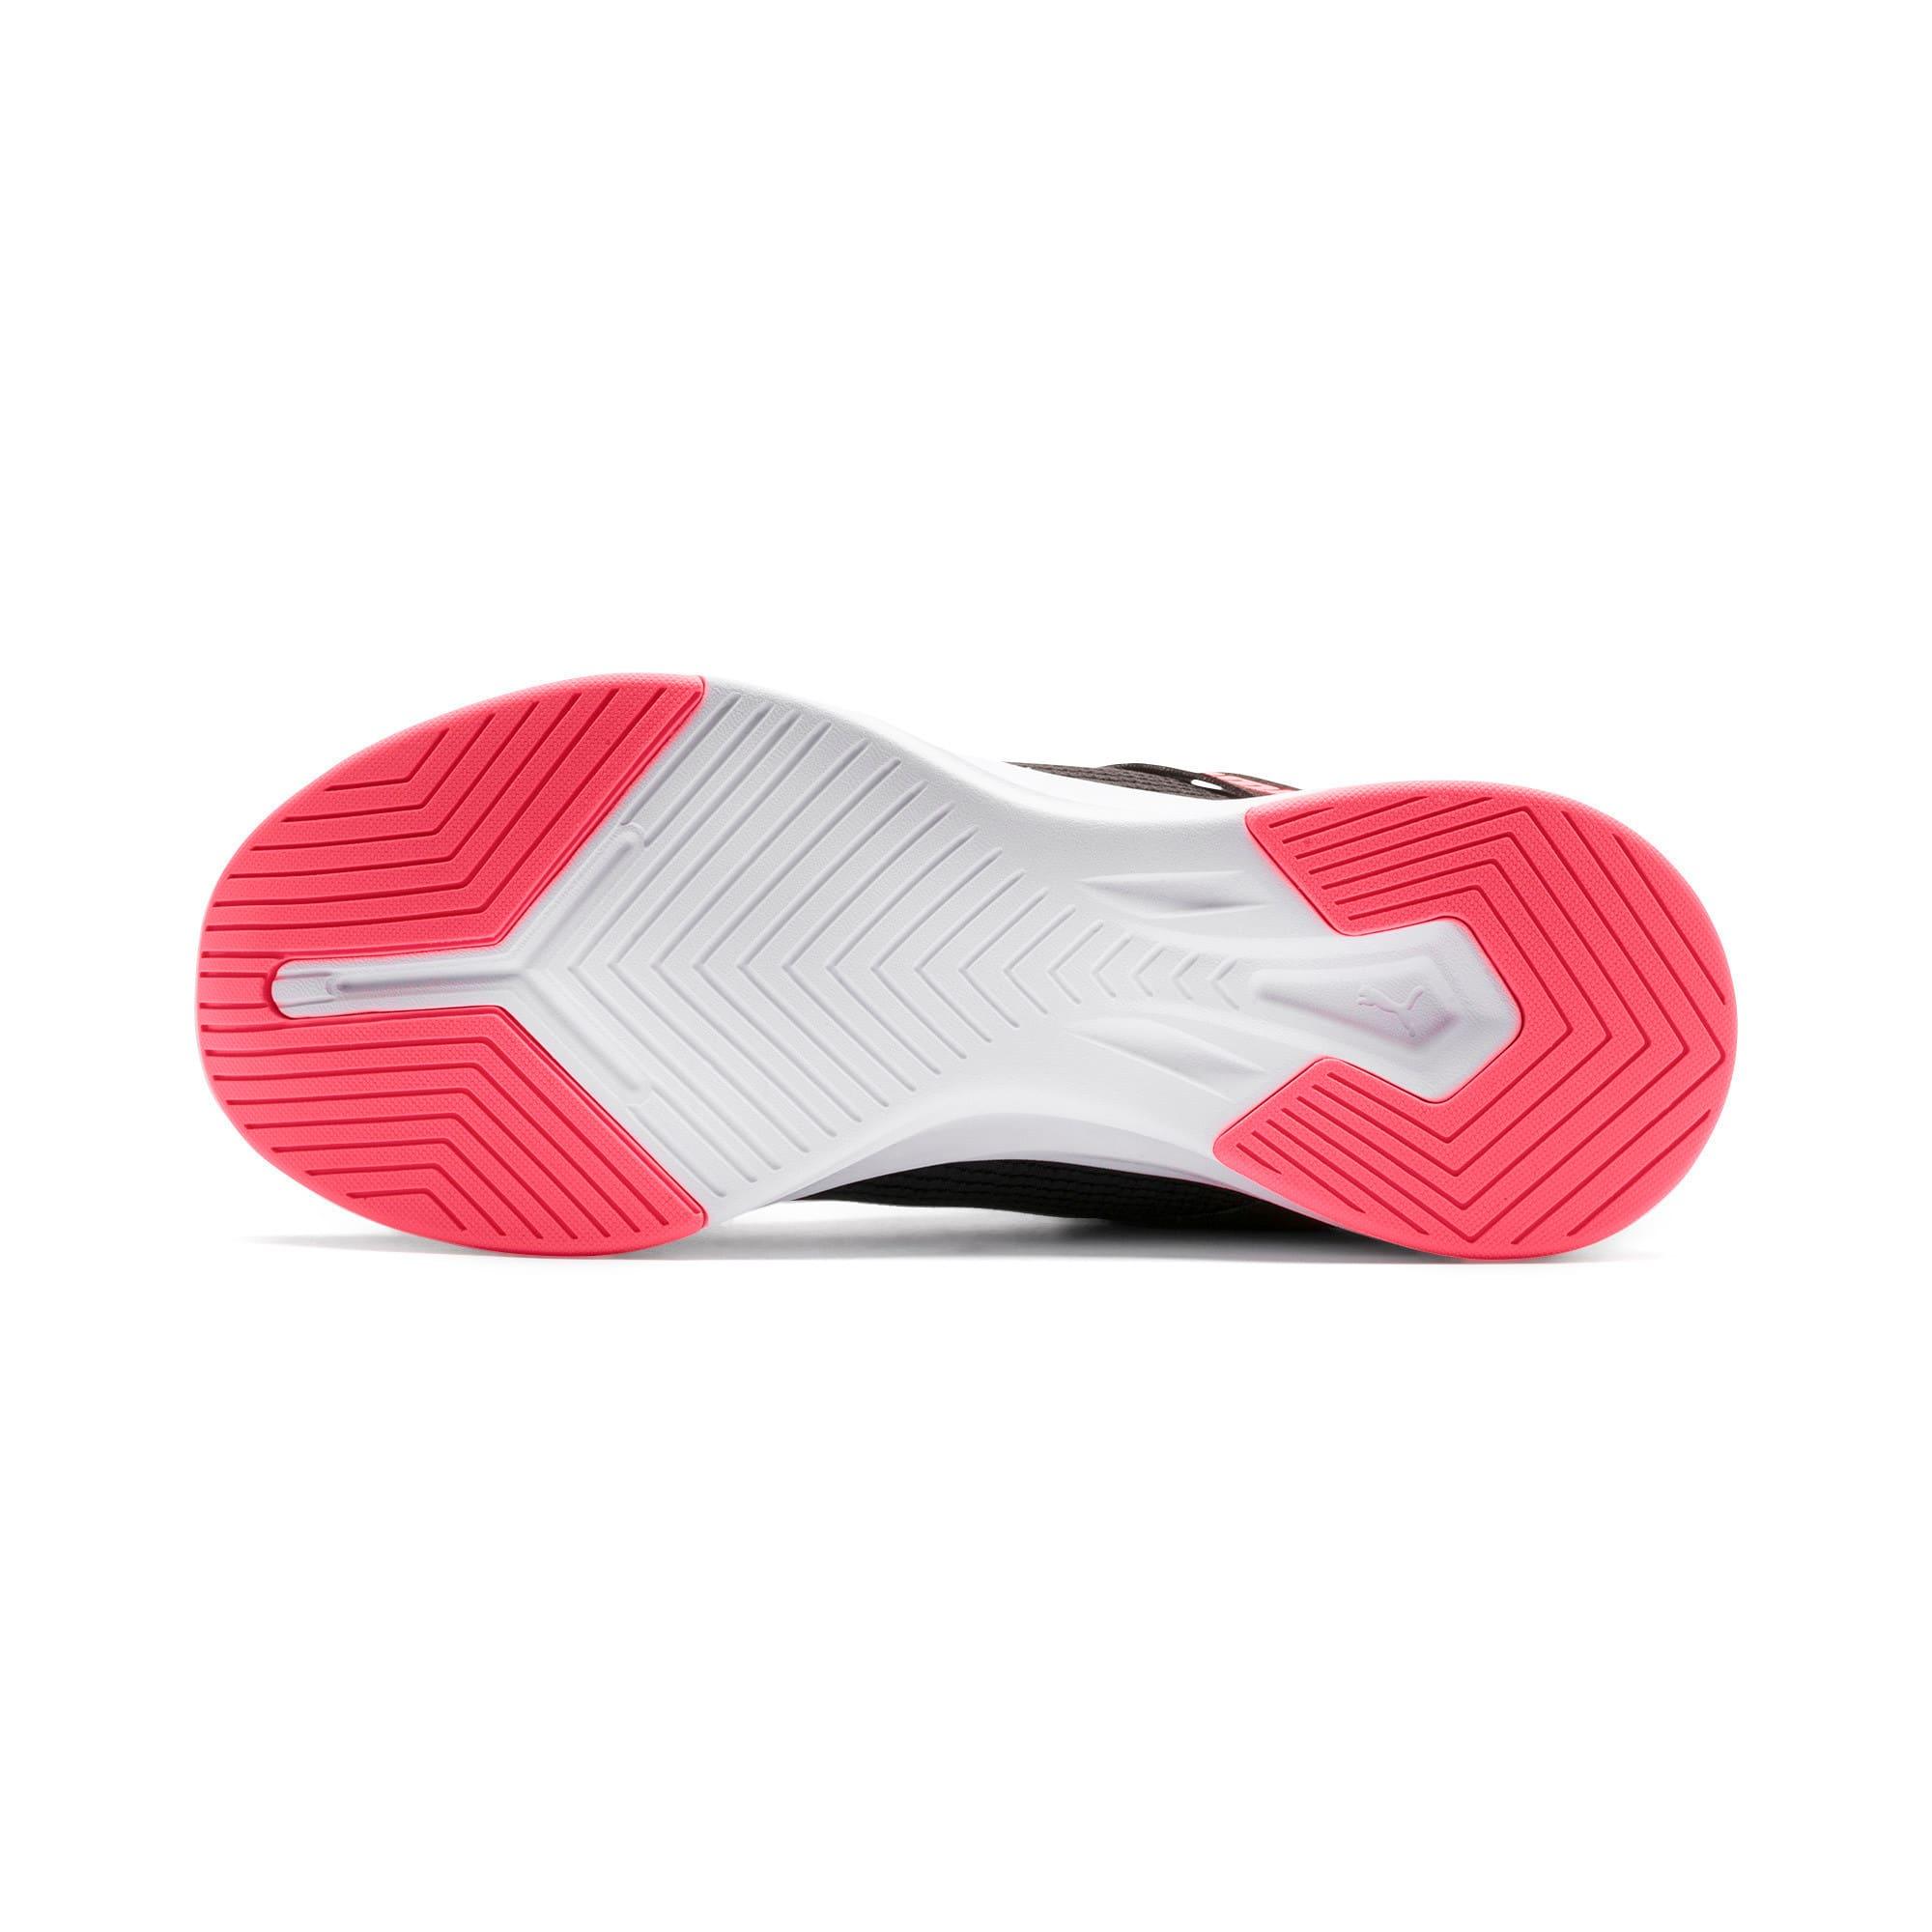 Thumbnail 6 of Radiate XT Women's Training Sneakers, Puma Black-Pink Alert, medium-IND